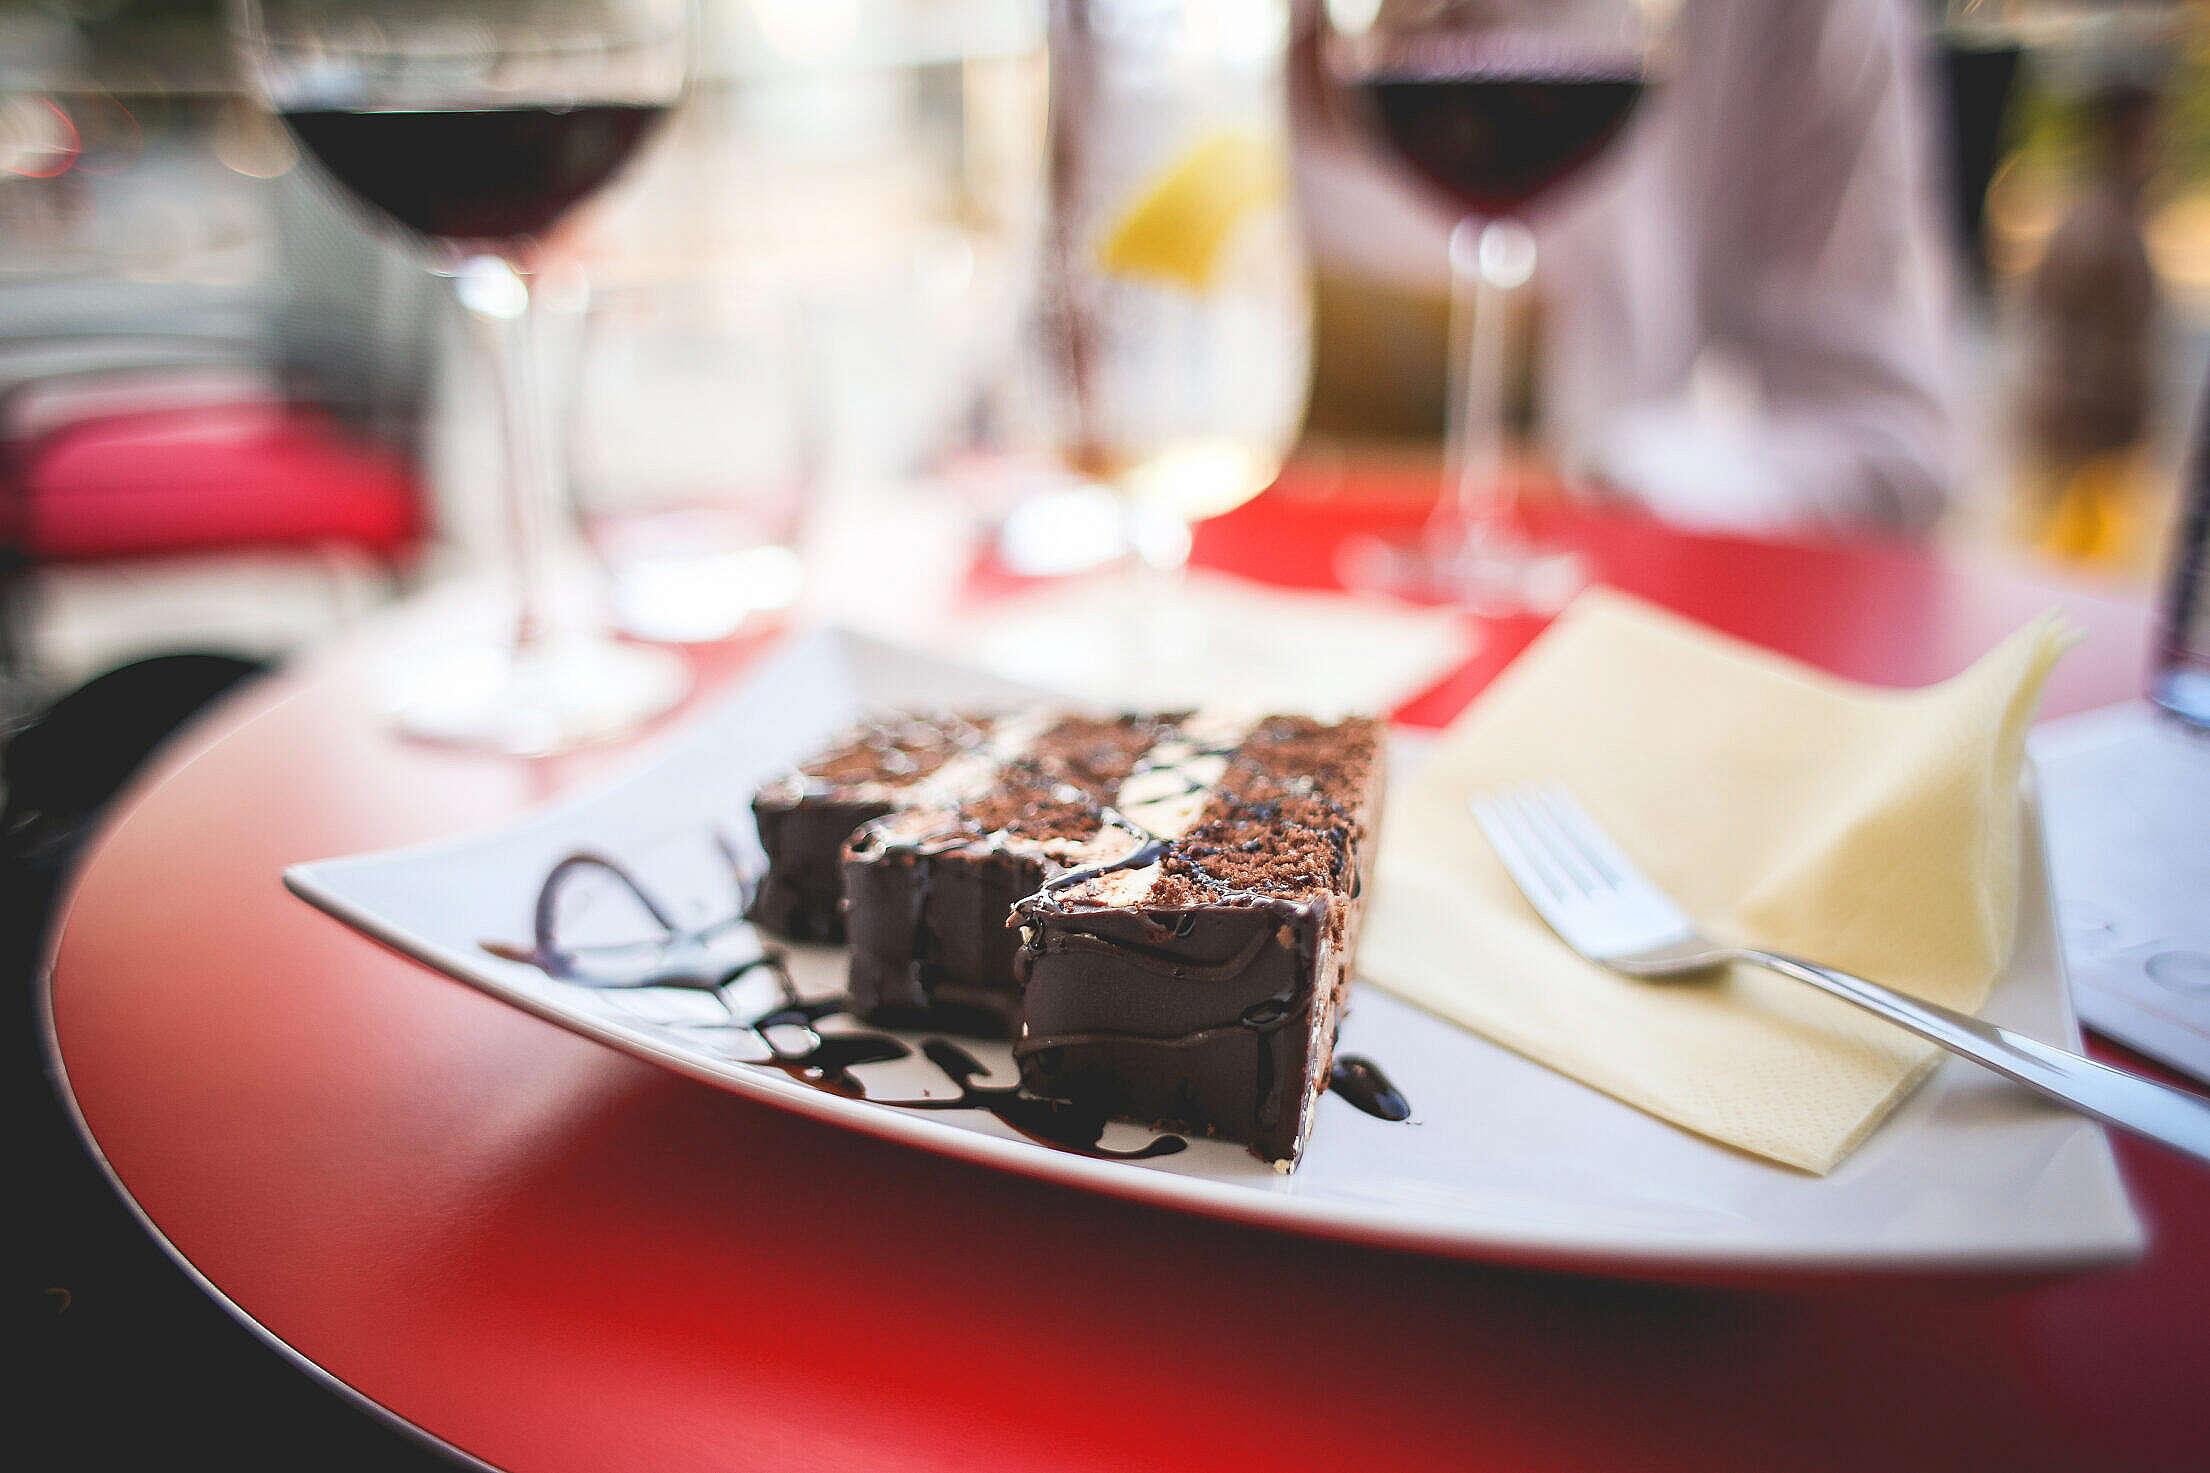 Sweet Yummy Chocolate Cake Free Stock Photo